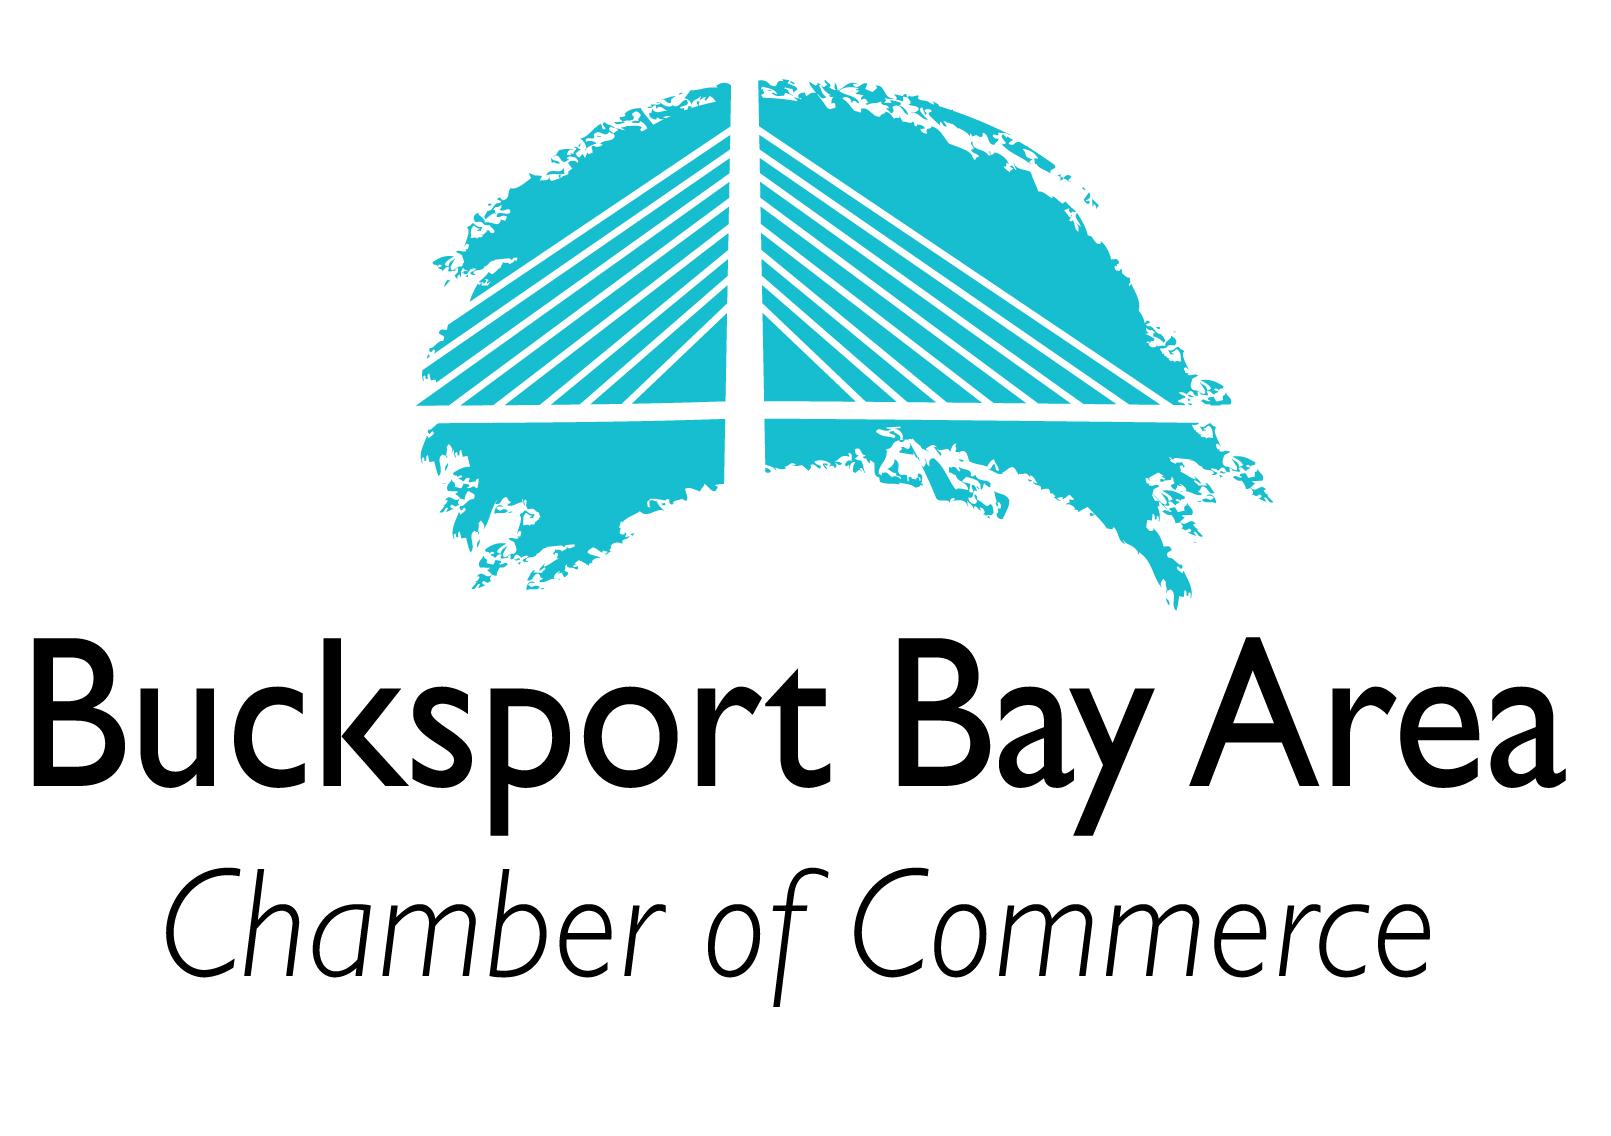 Bucksport Bay Area Chamber of Commerce